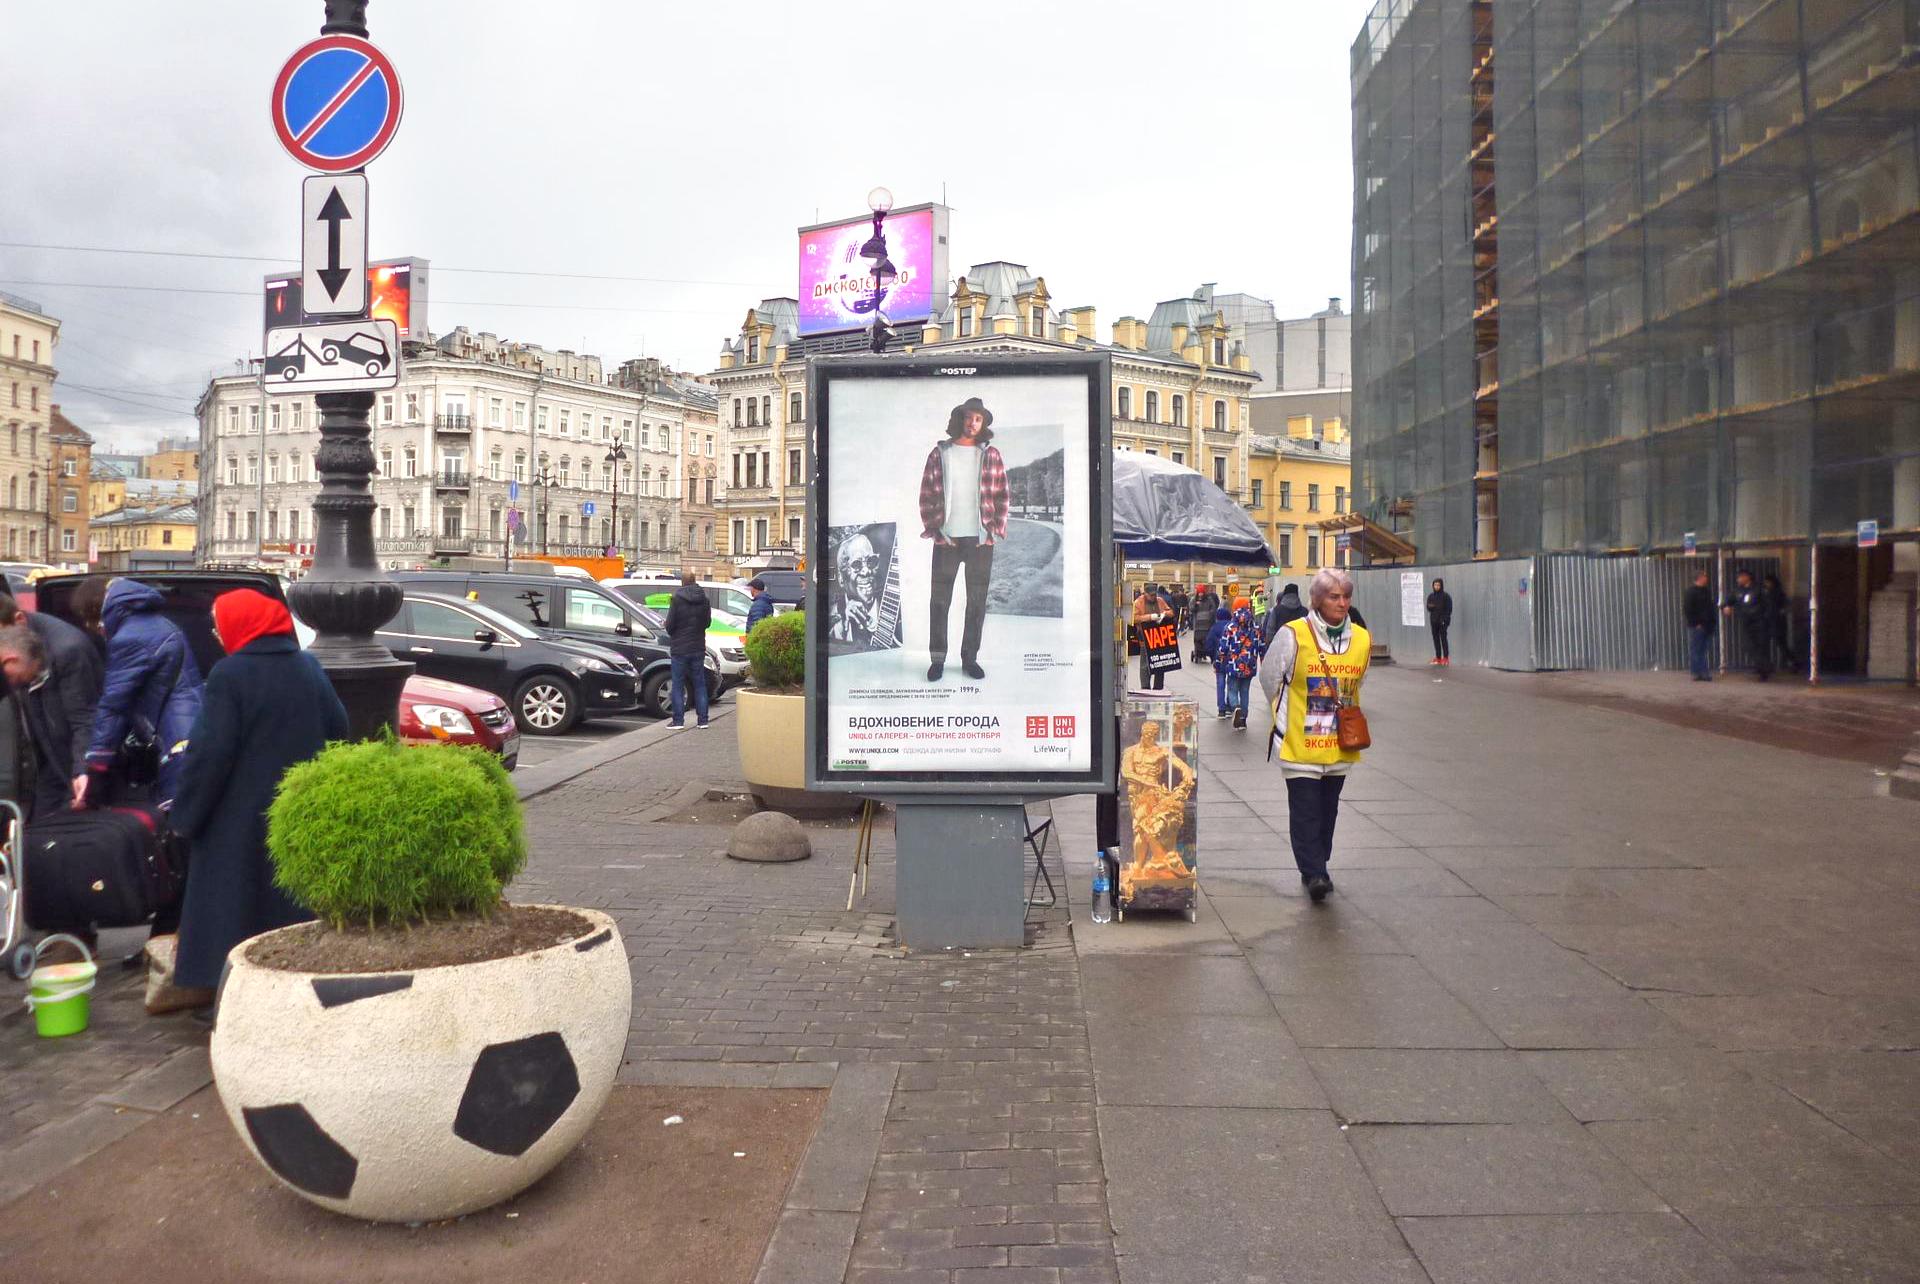 Восстания пл. (2) - Московский вокзал